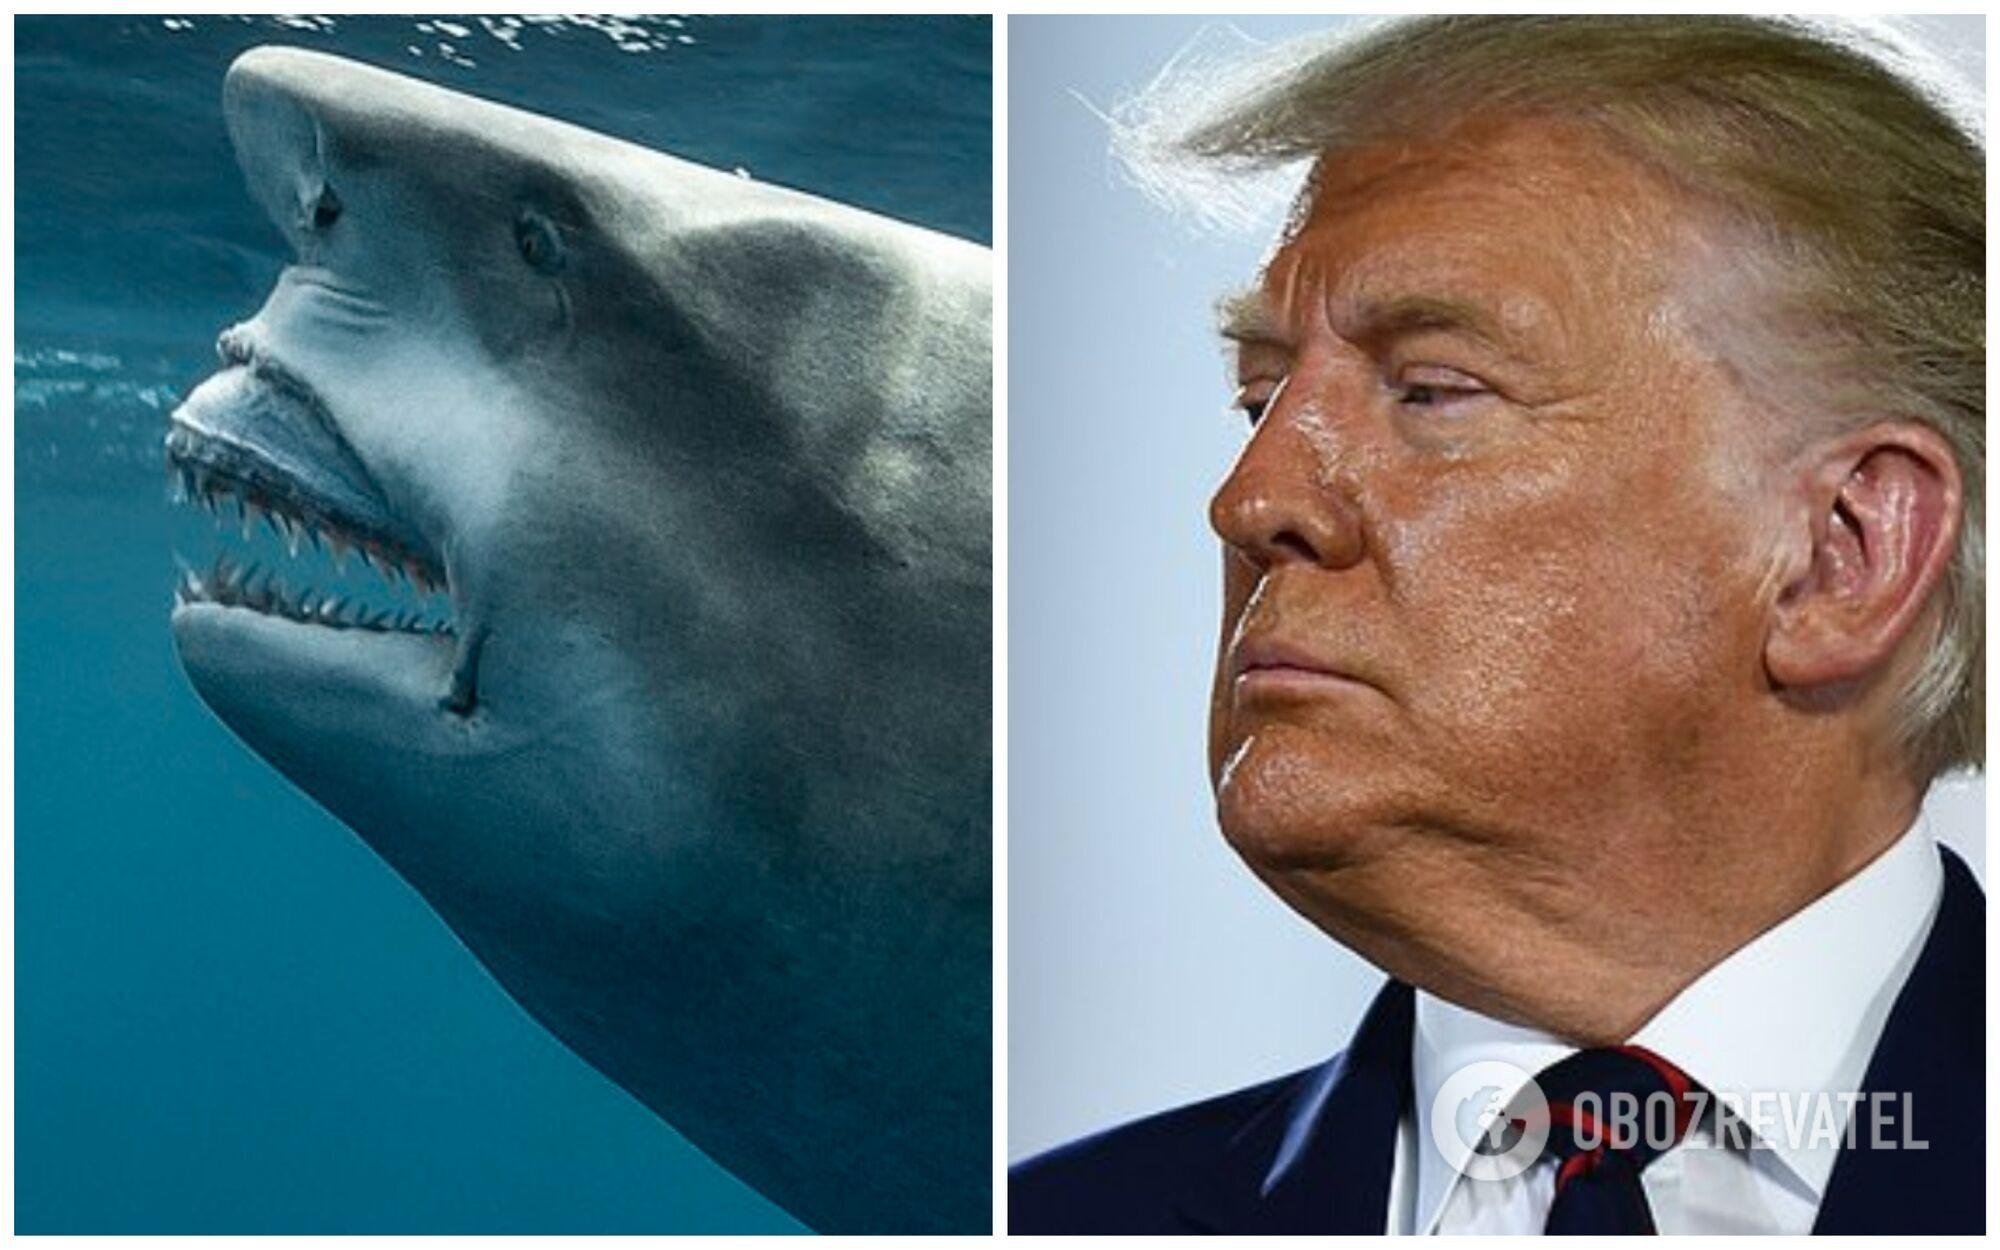 В море нашли акулу, похожую на Трампа.